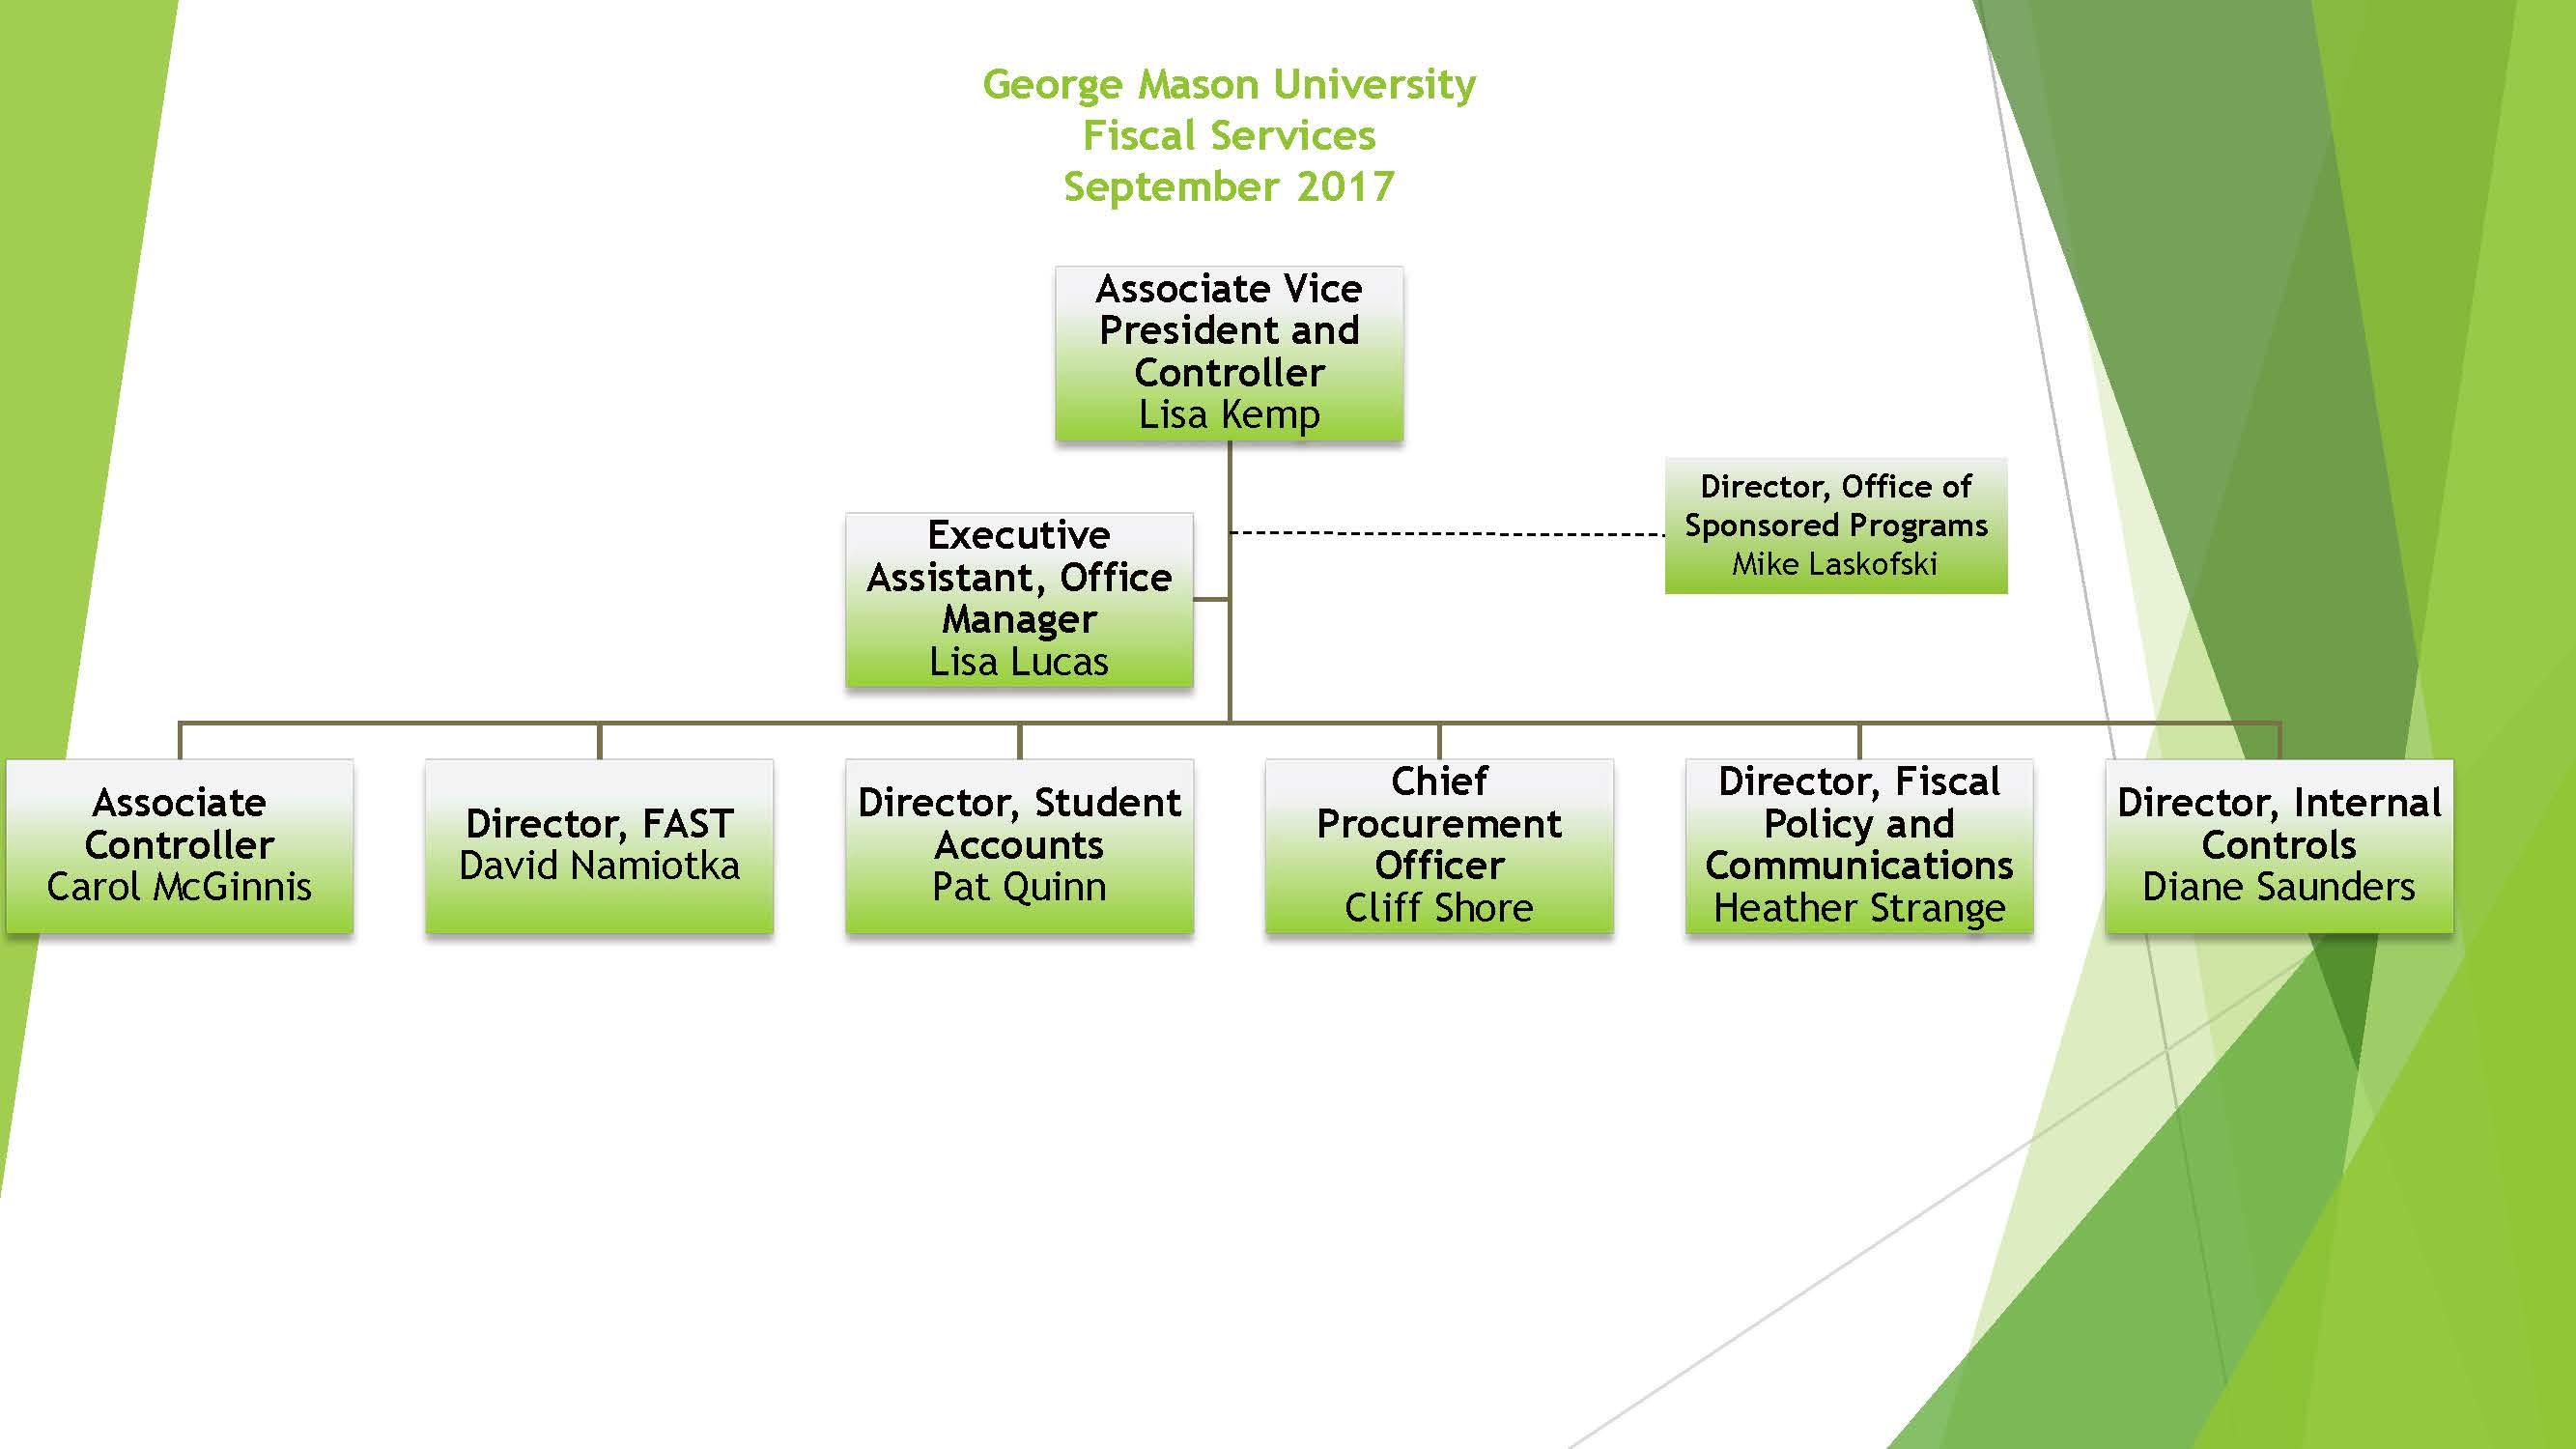 Organizational Charts Fiscal Services George Mason